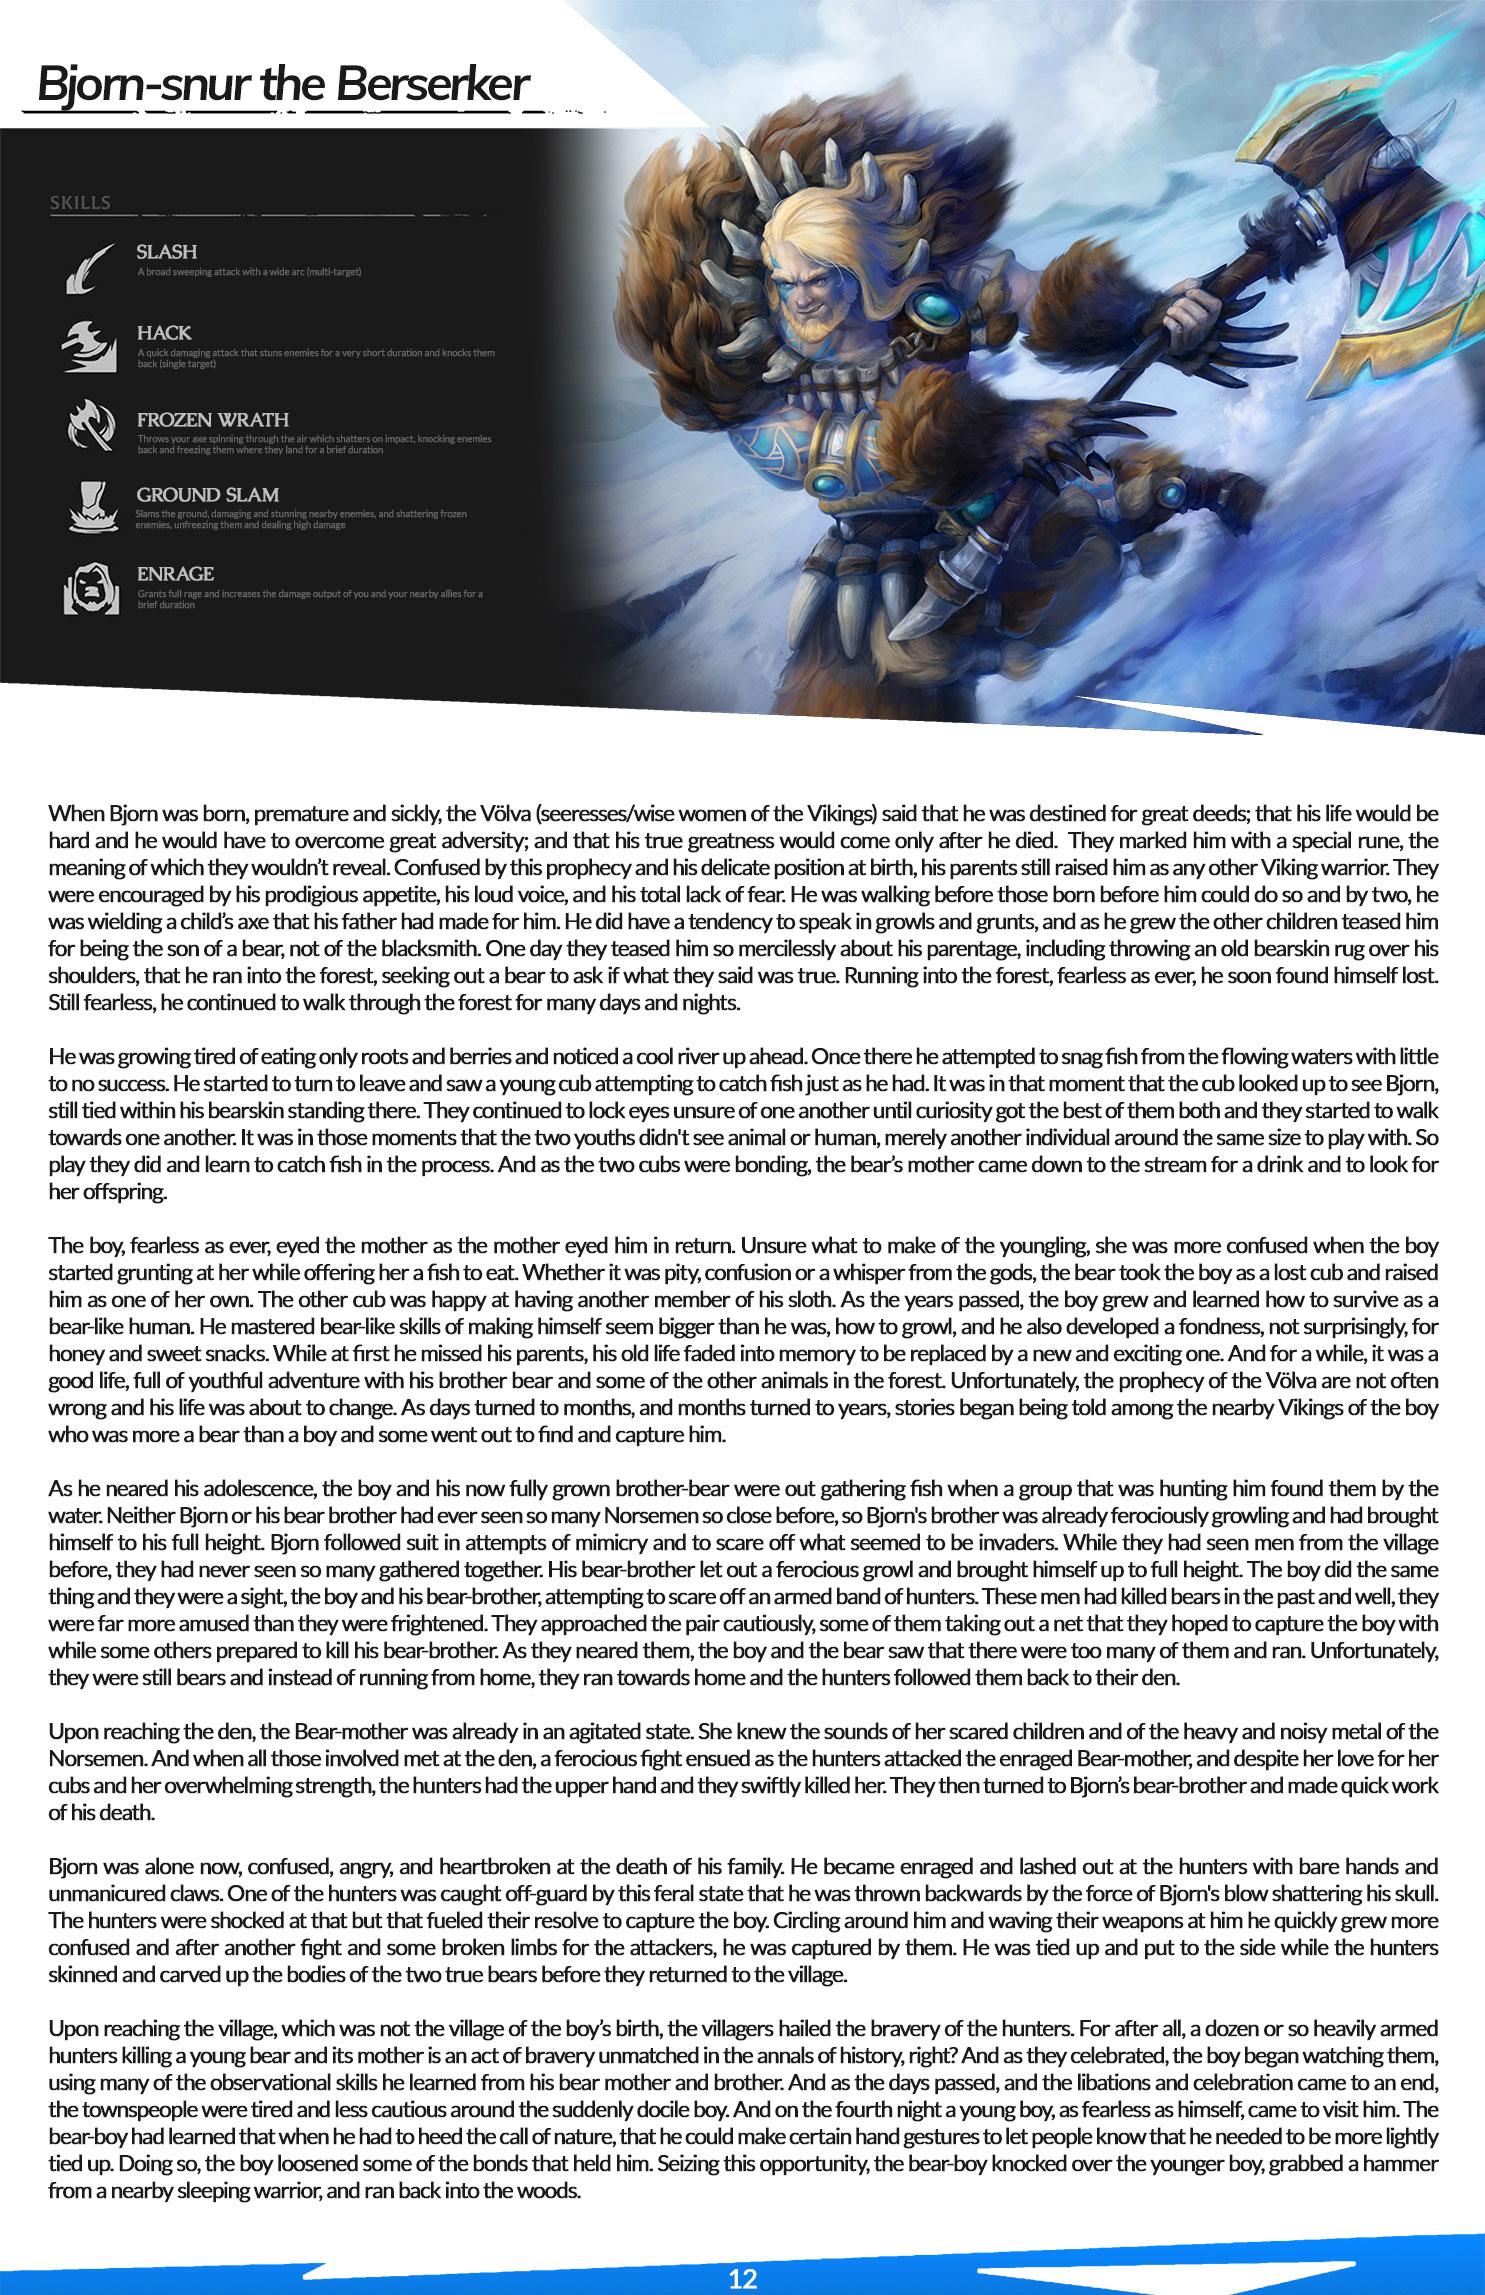 FSR-Guide_11x17_master_17-Final-for-FA-13